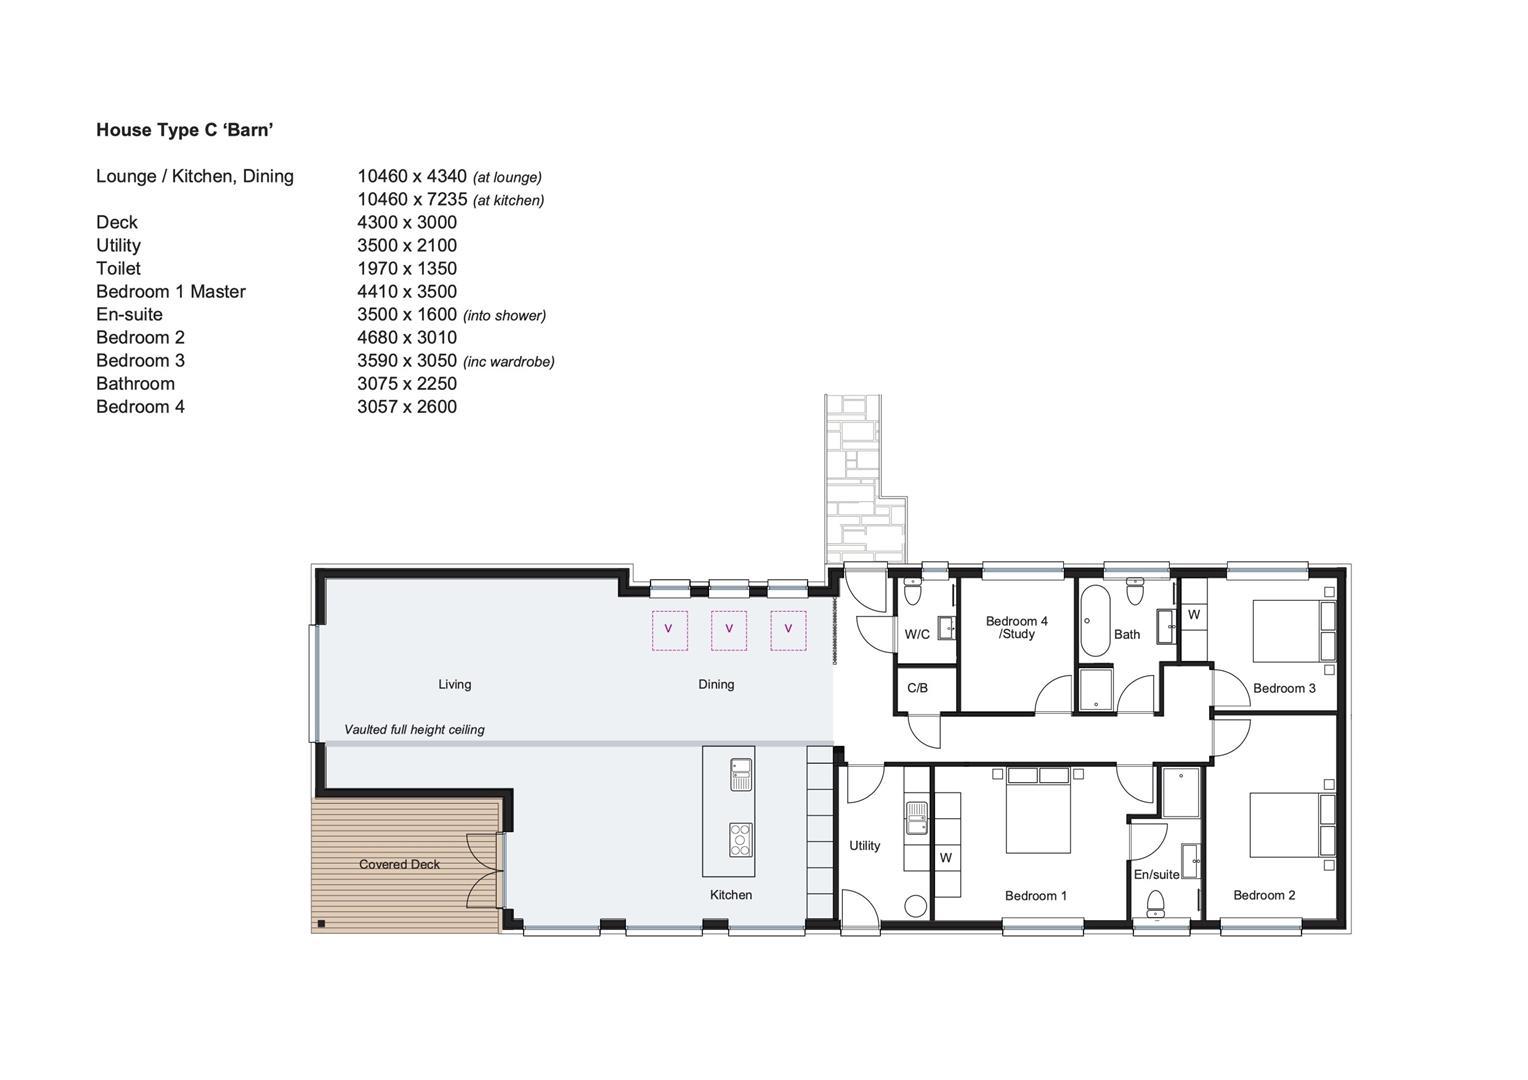 HOUSE TYPE C Floorplan.jpg